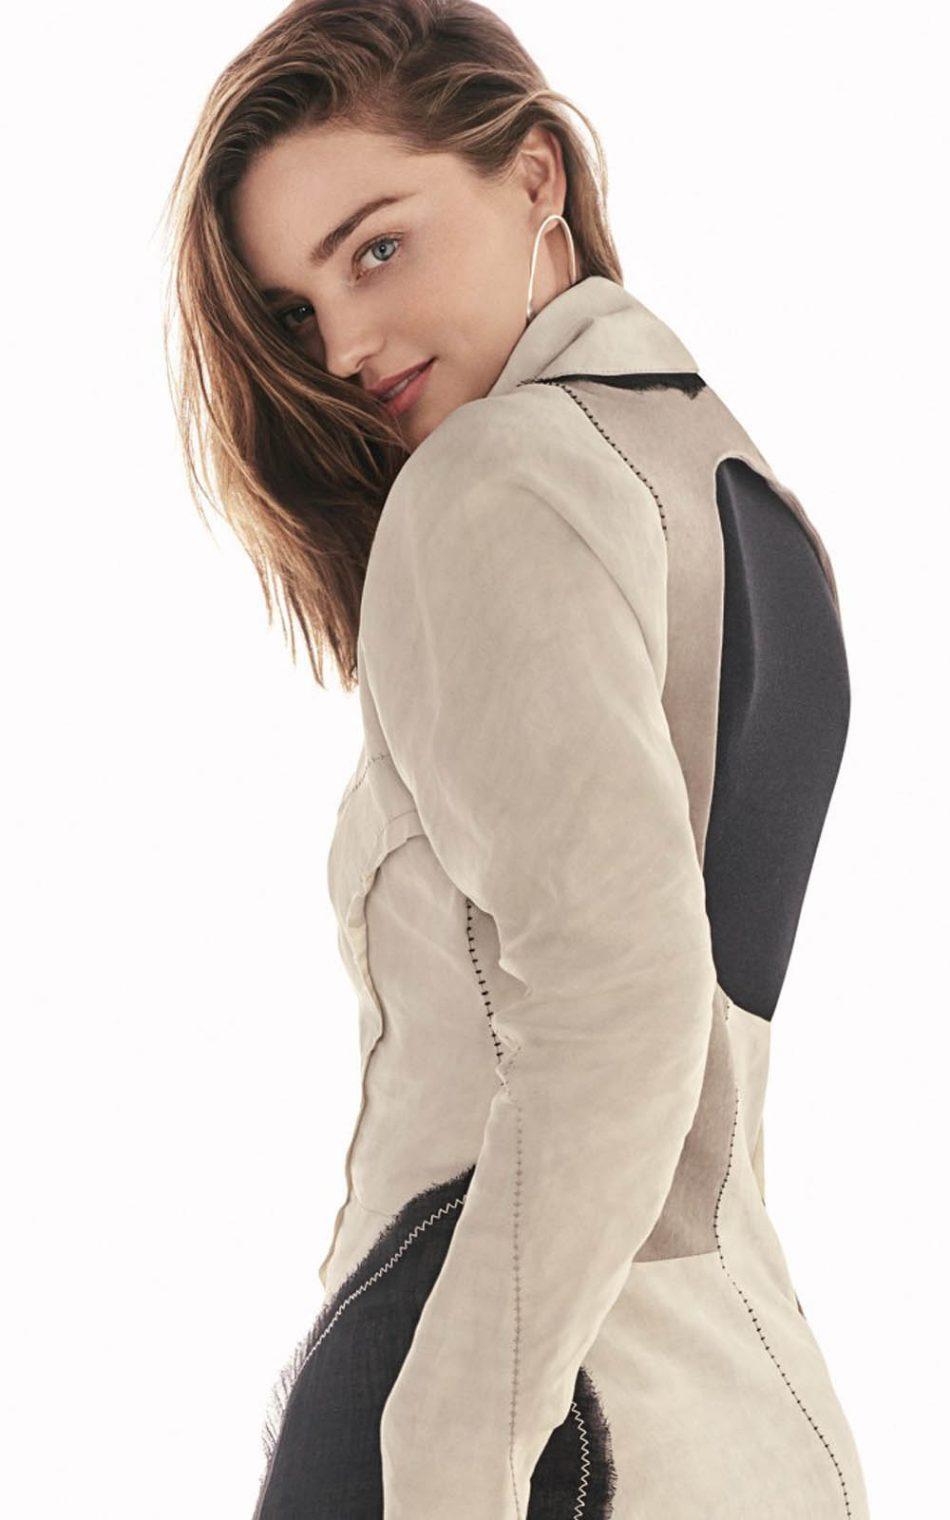 Miranda Kerr Style Click HD Mobile Wallpaper